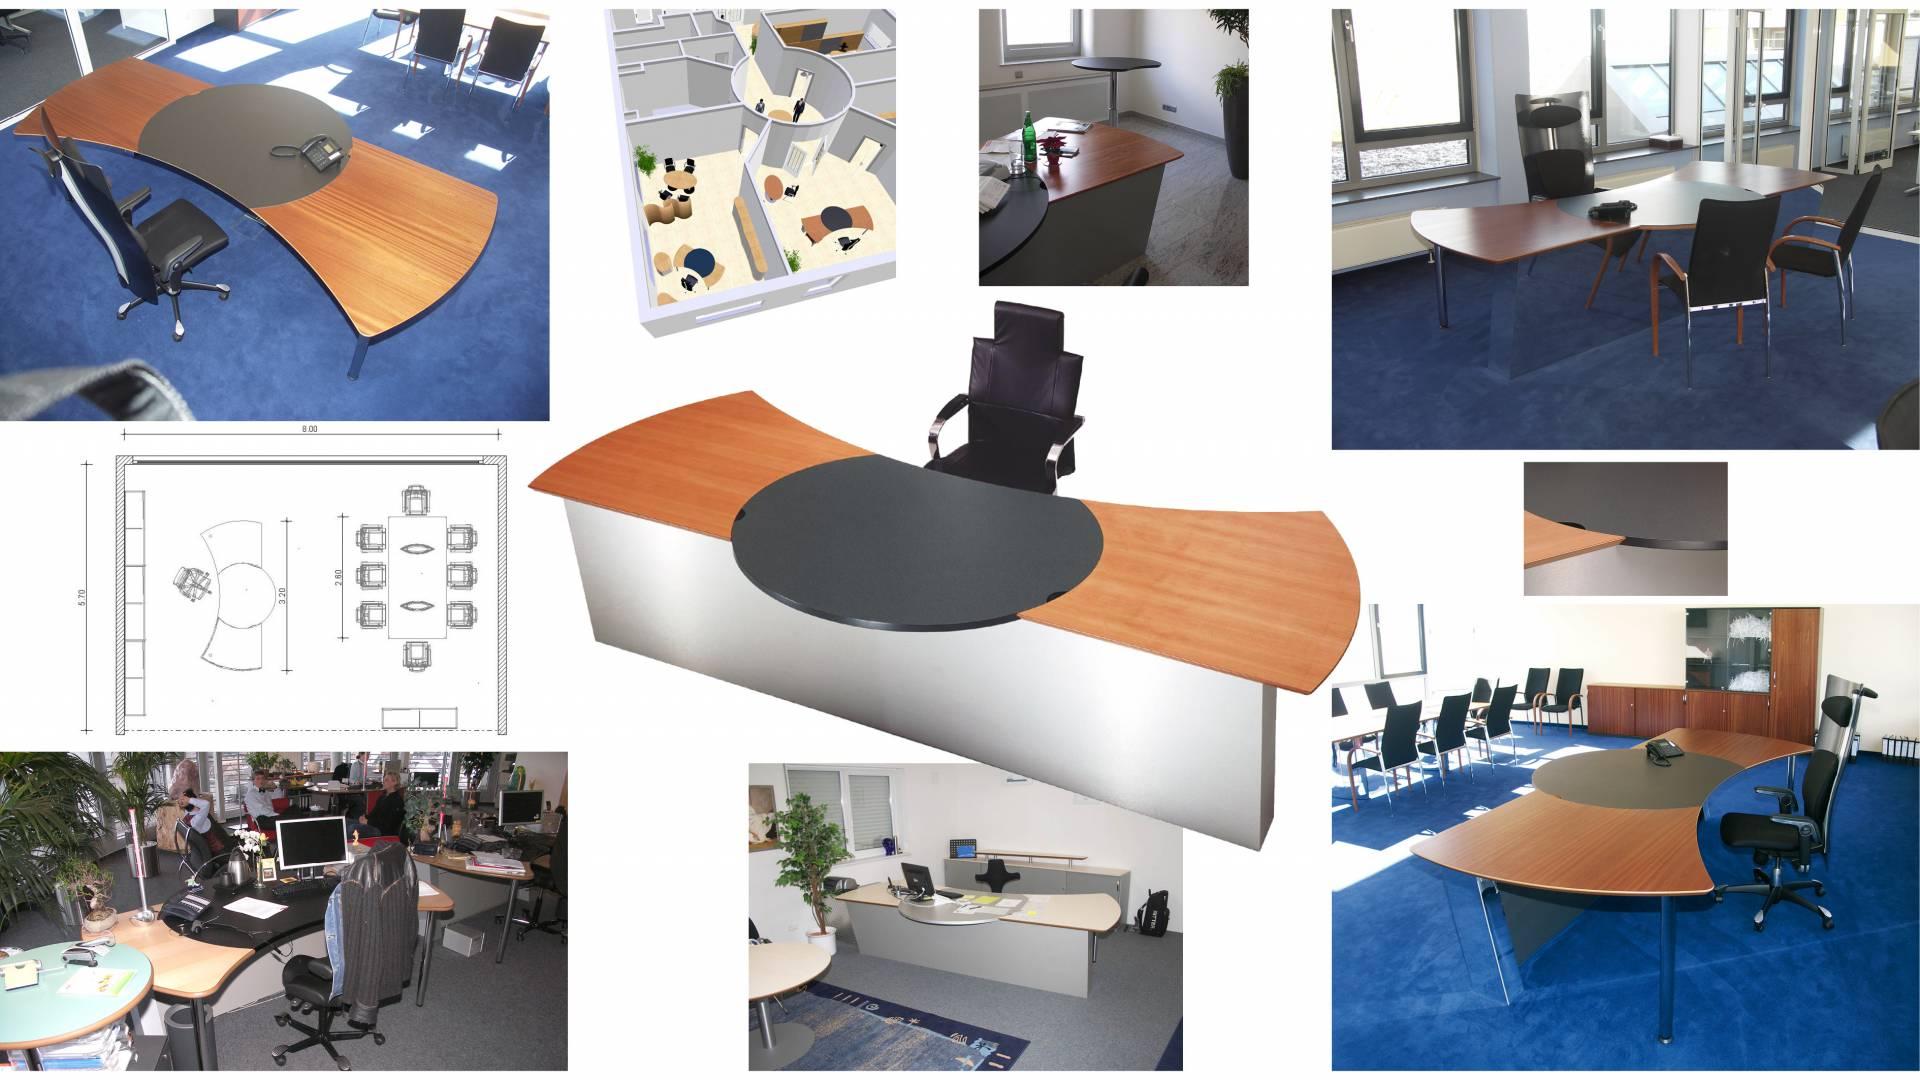 circon executive command - Chefschreibtisch - Souveränes Arbeitsplatzdesign